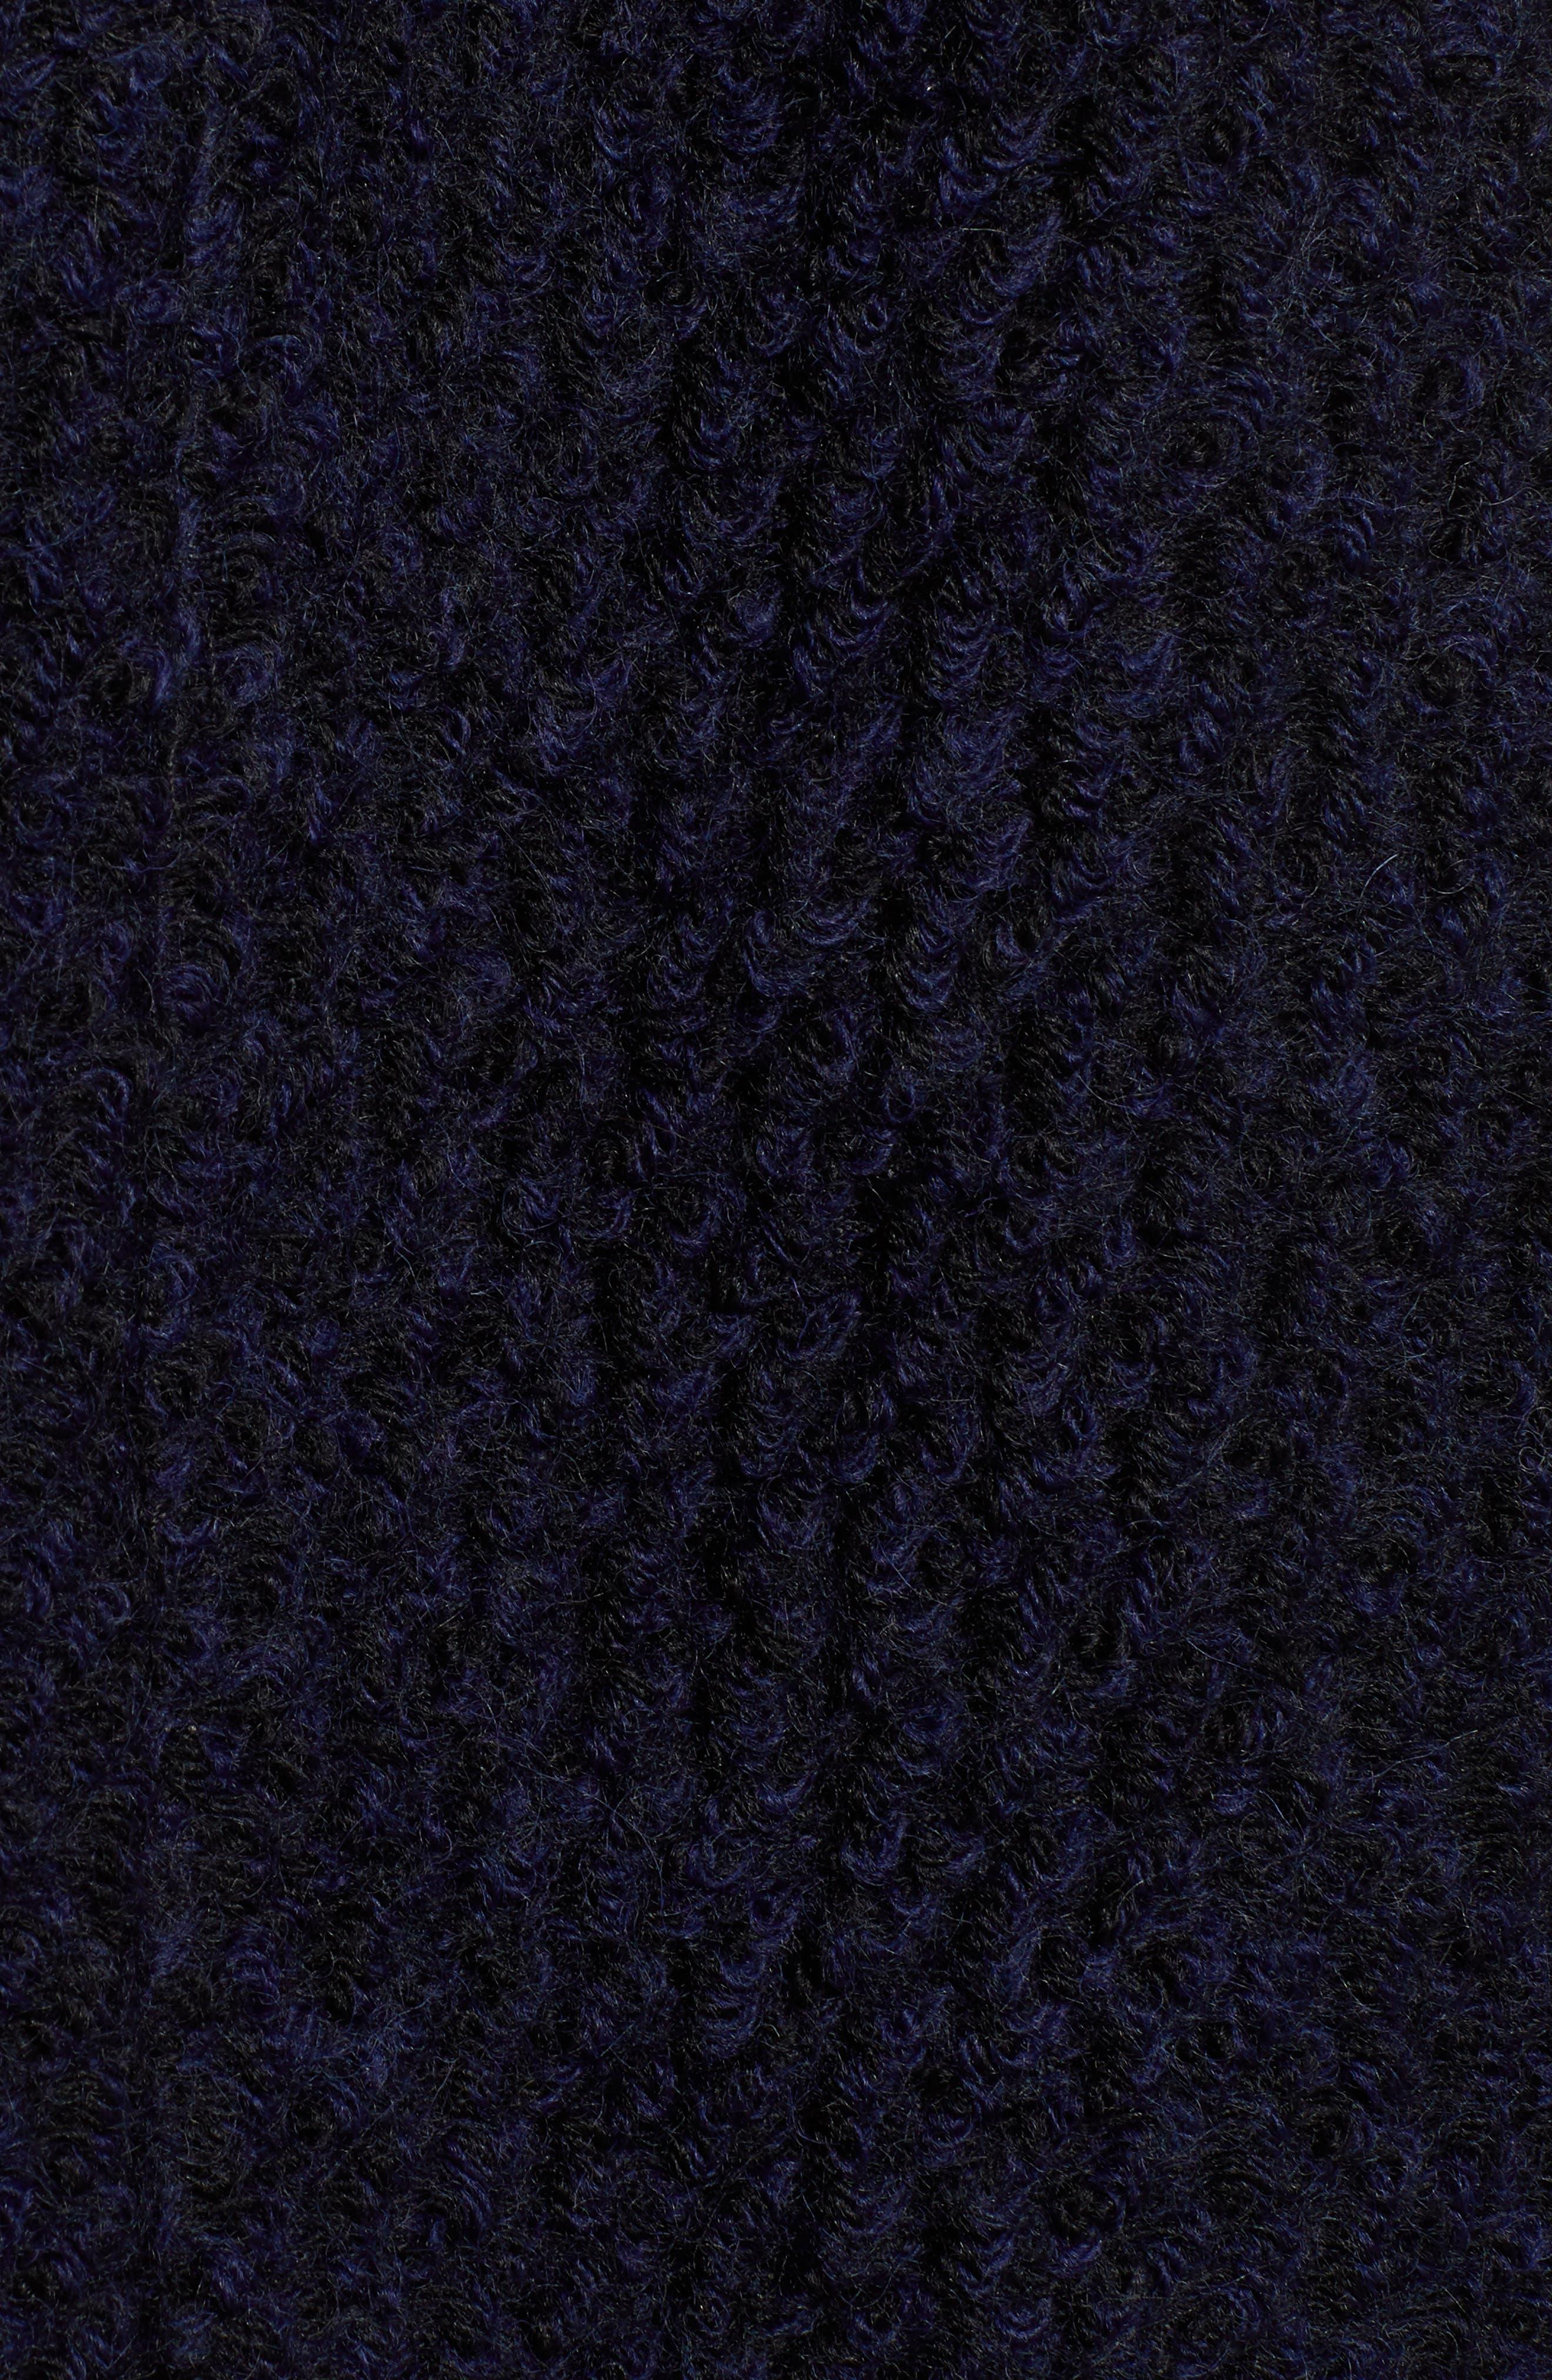 Belted Bouclé Wool Blend Coat,                             Alternate thumbnail 7, color,                             BLACK/ NAVY